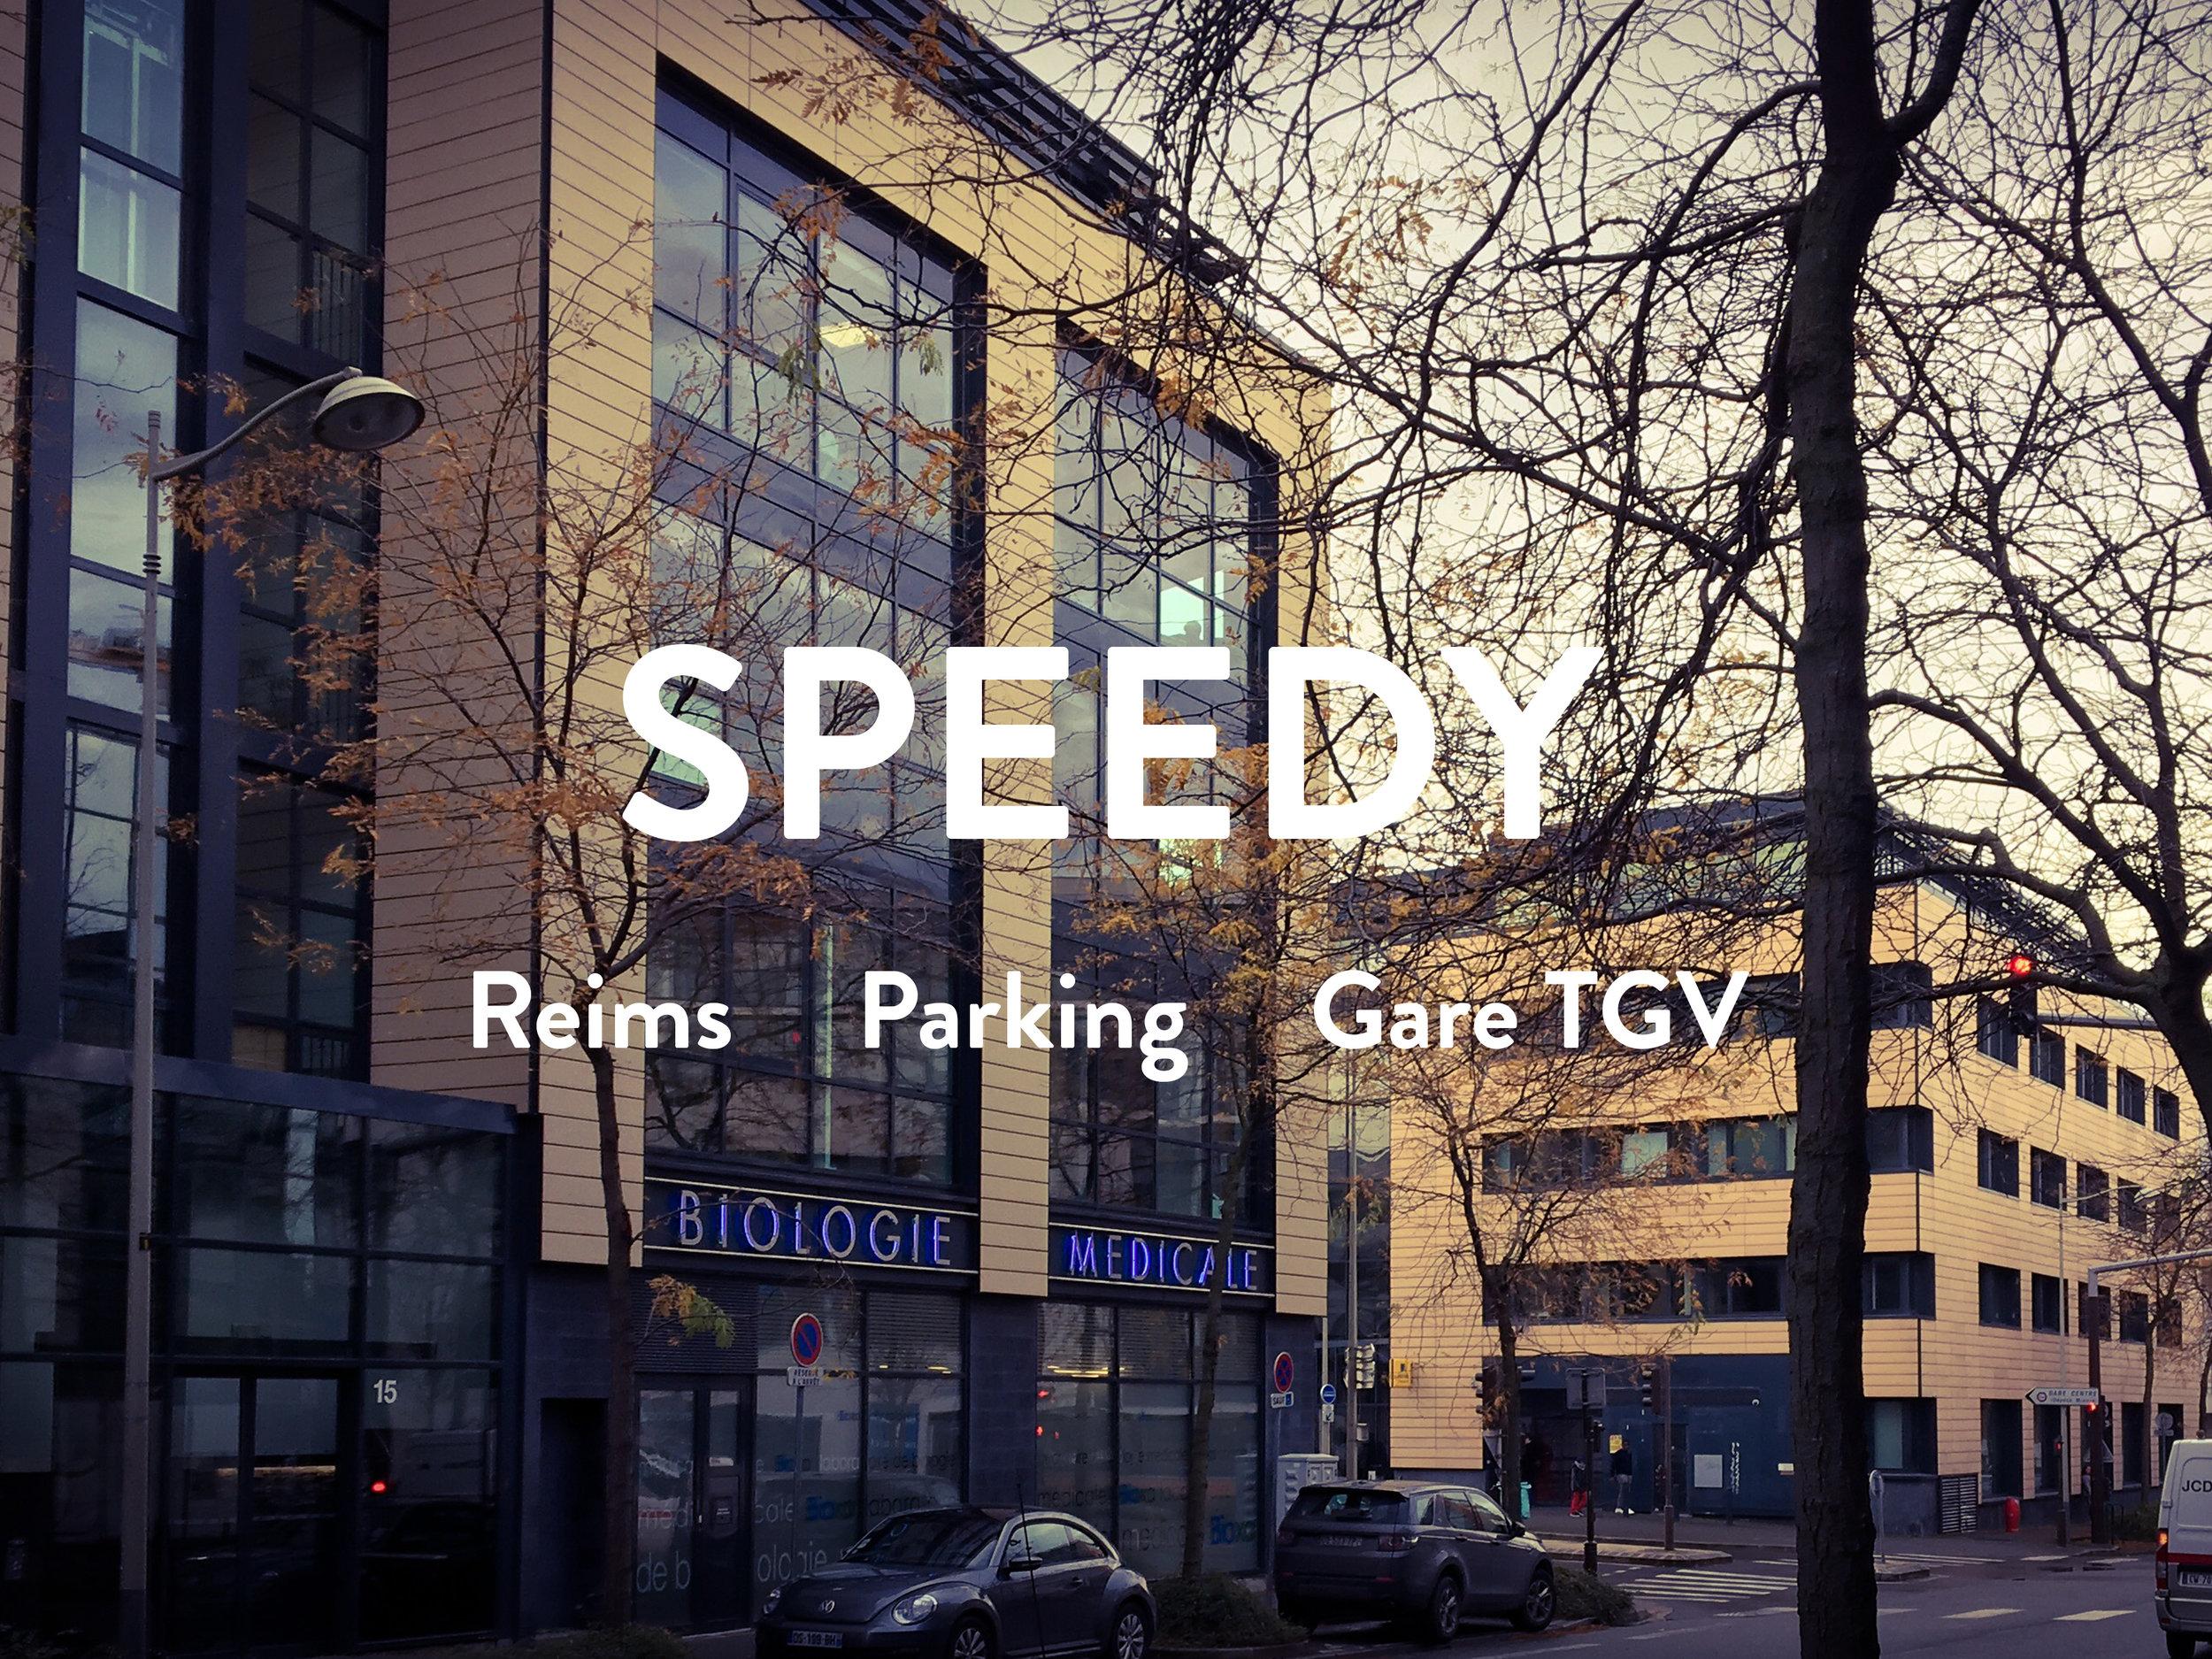 parking reims vendu gare tgv